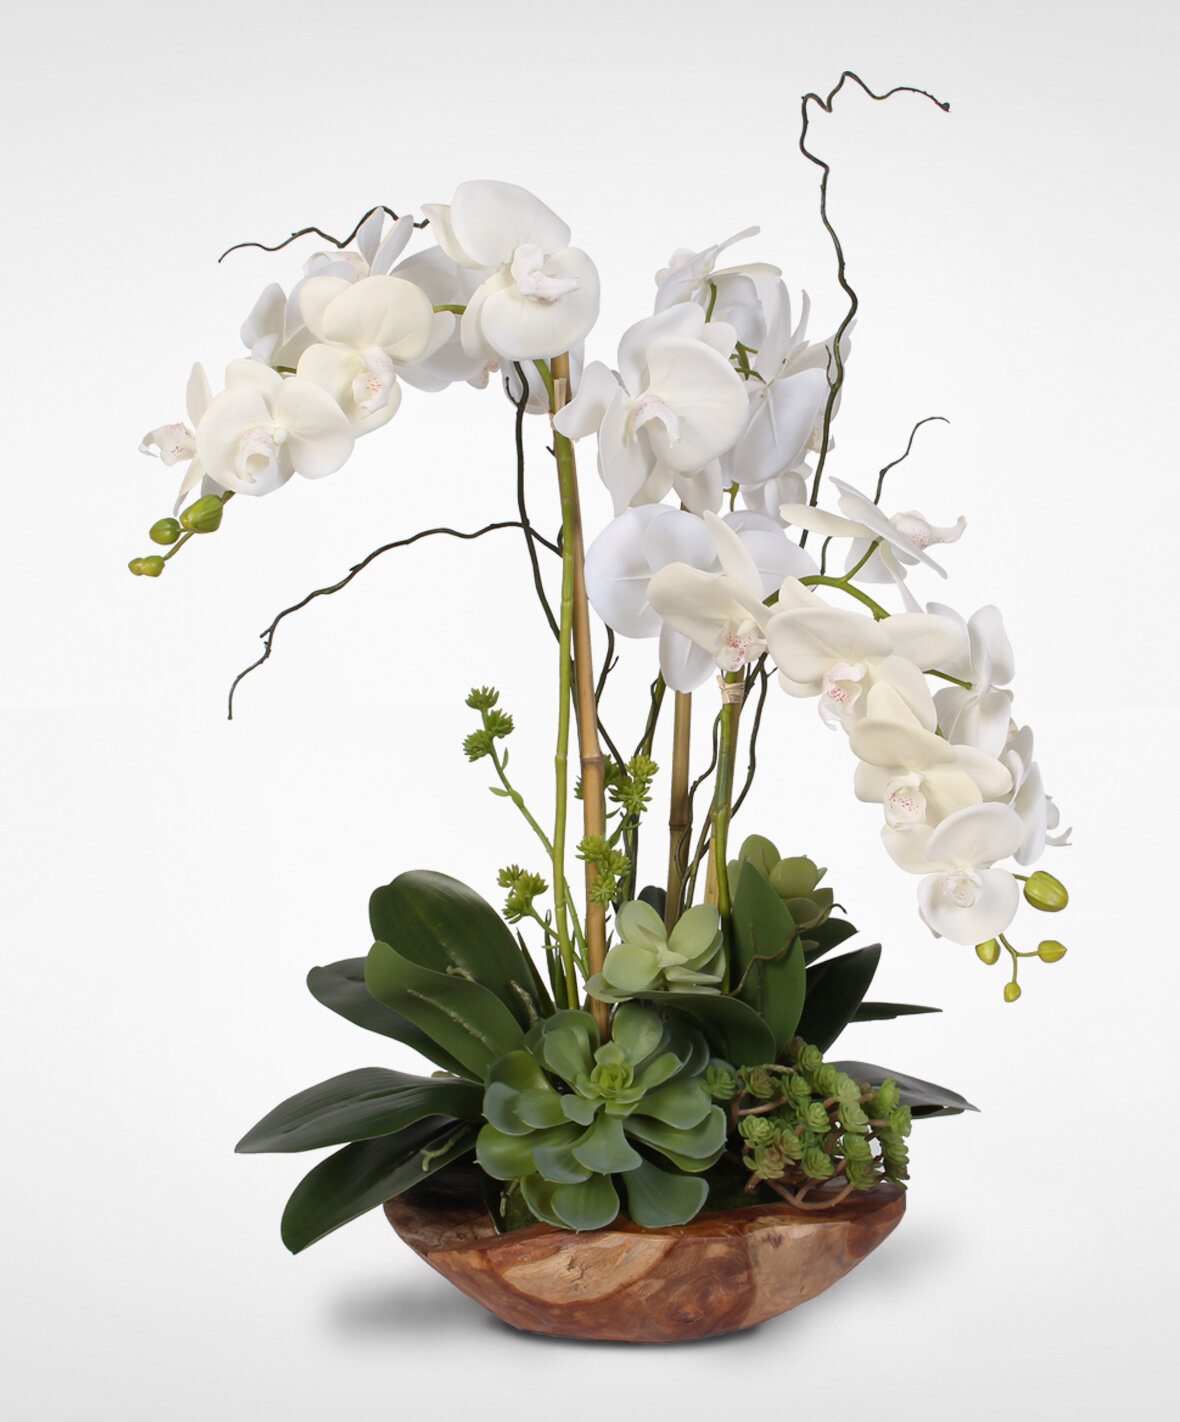 Primrue Real Touch Phalaenopsis Silk Orchid With Succulents Floral Arrangement Reviews Wayfair